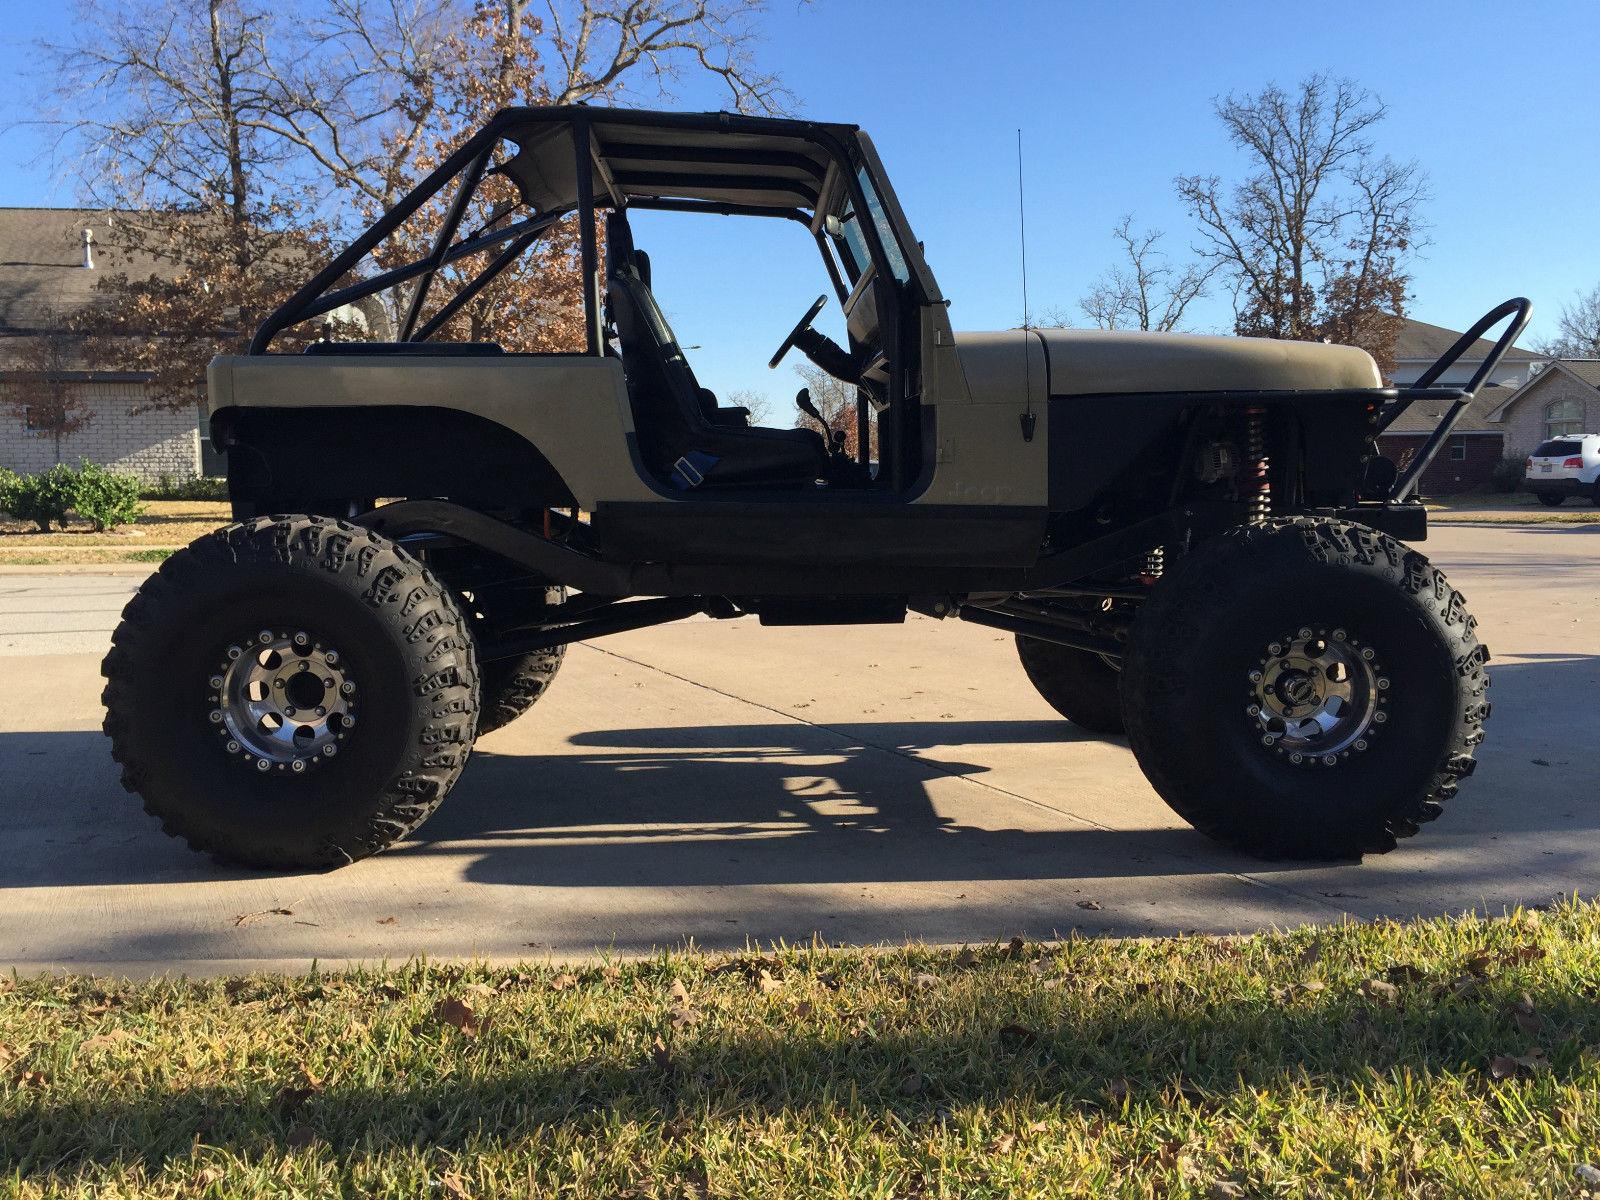 1992 Jeep Wrangler Yj Custom Rock Crawler Street Legal